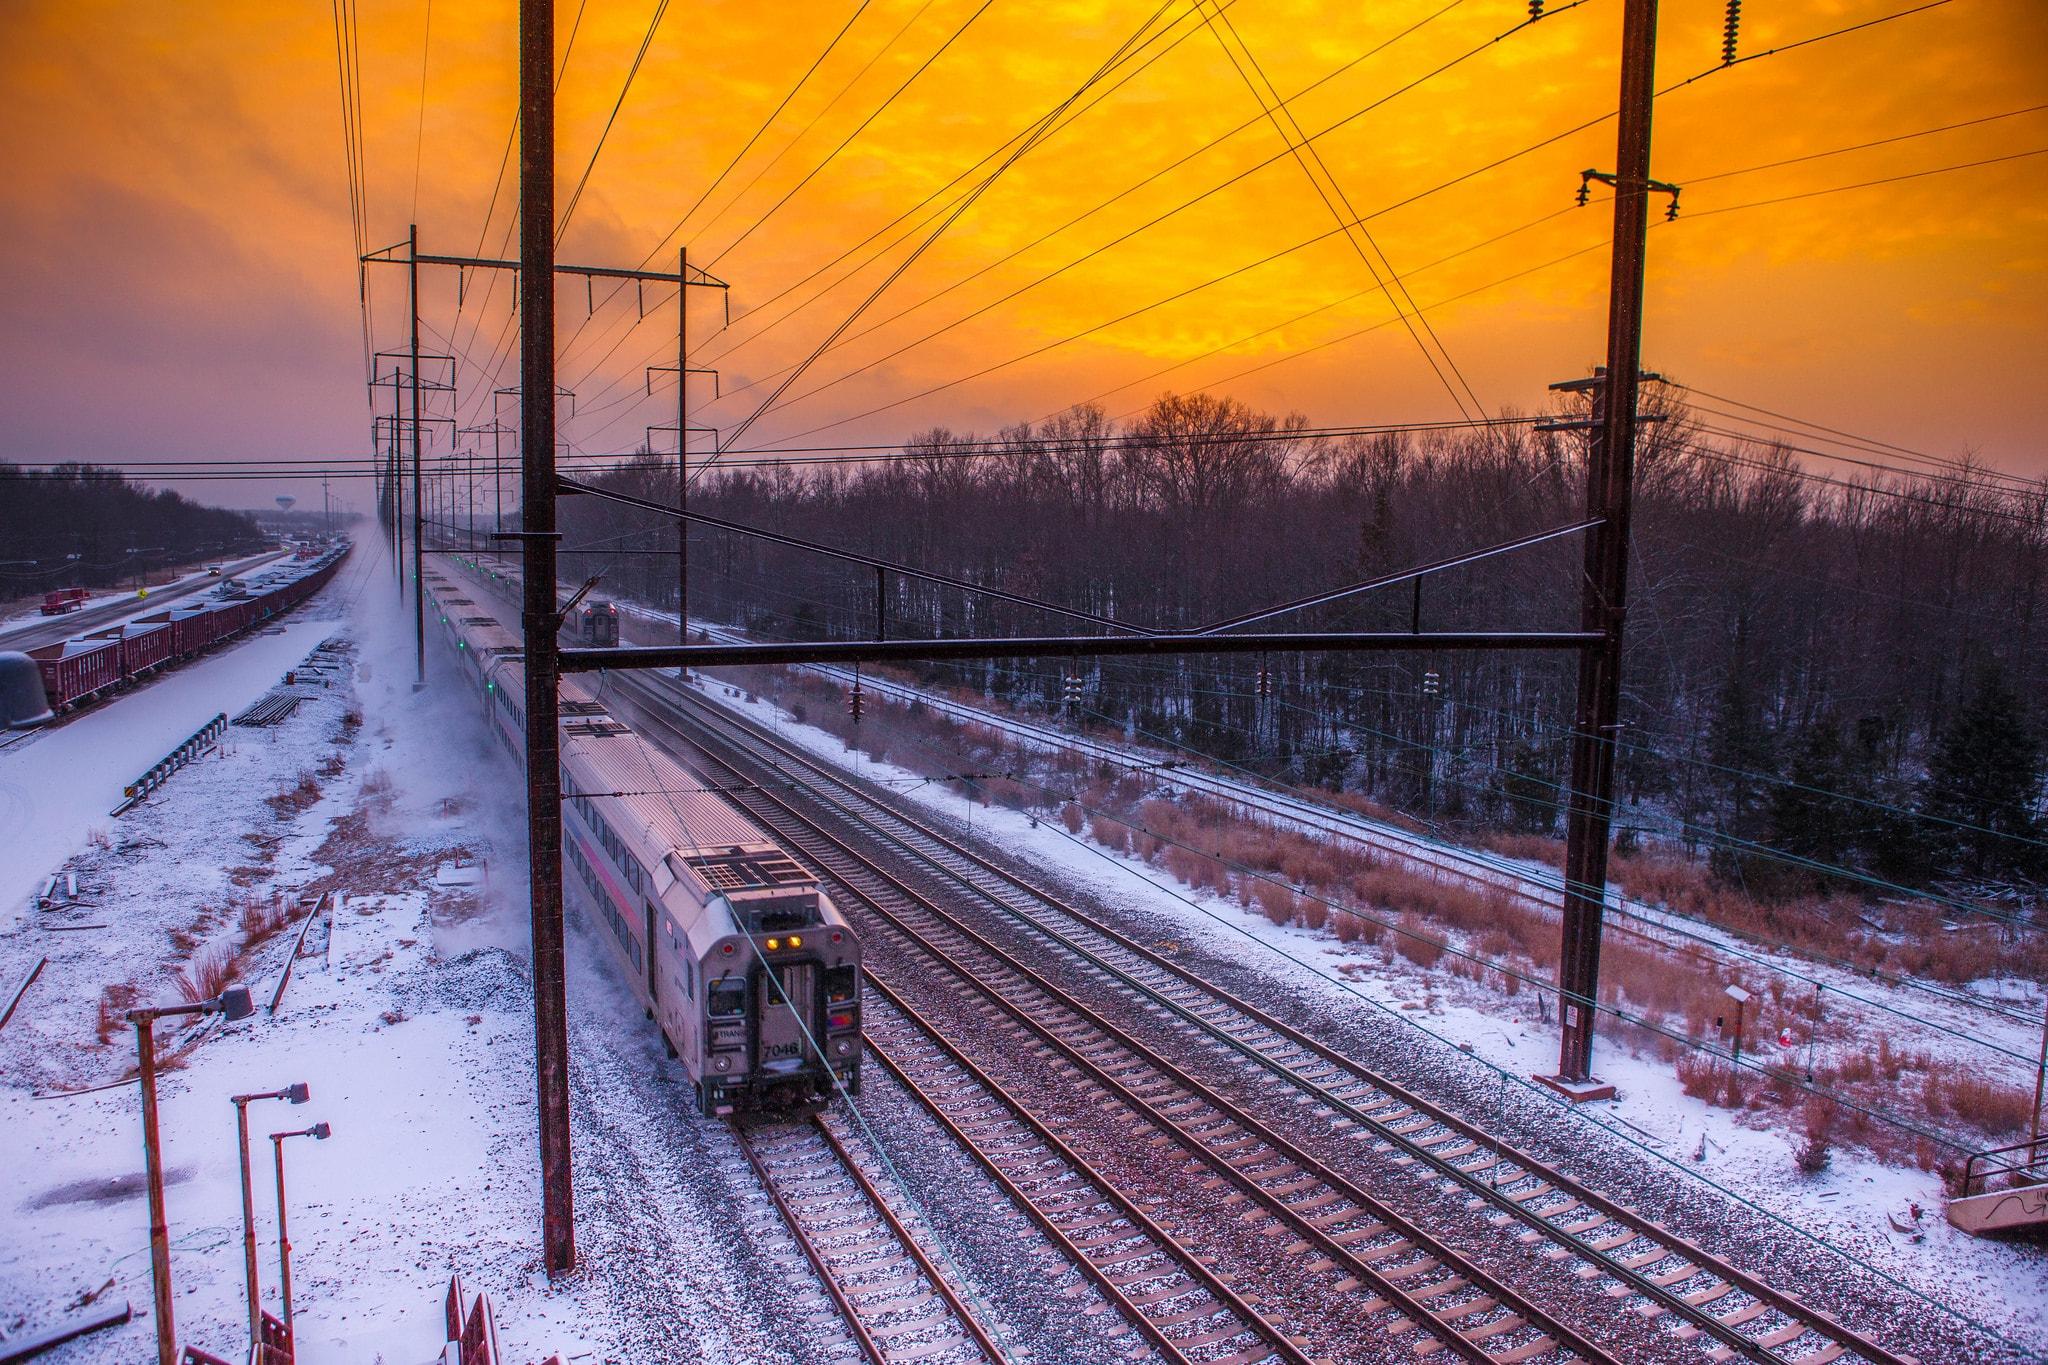 NJ Transit | Anthony Quintano Flickr